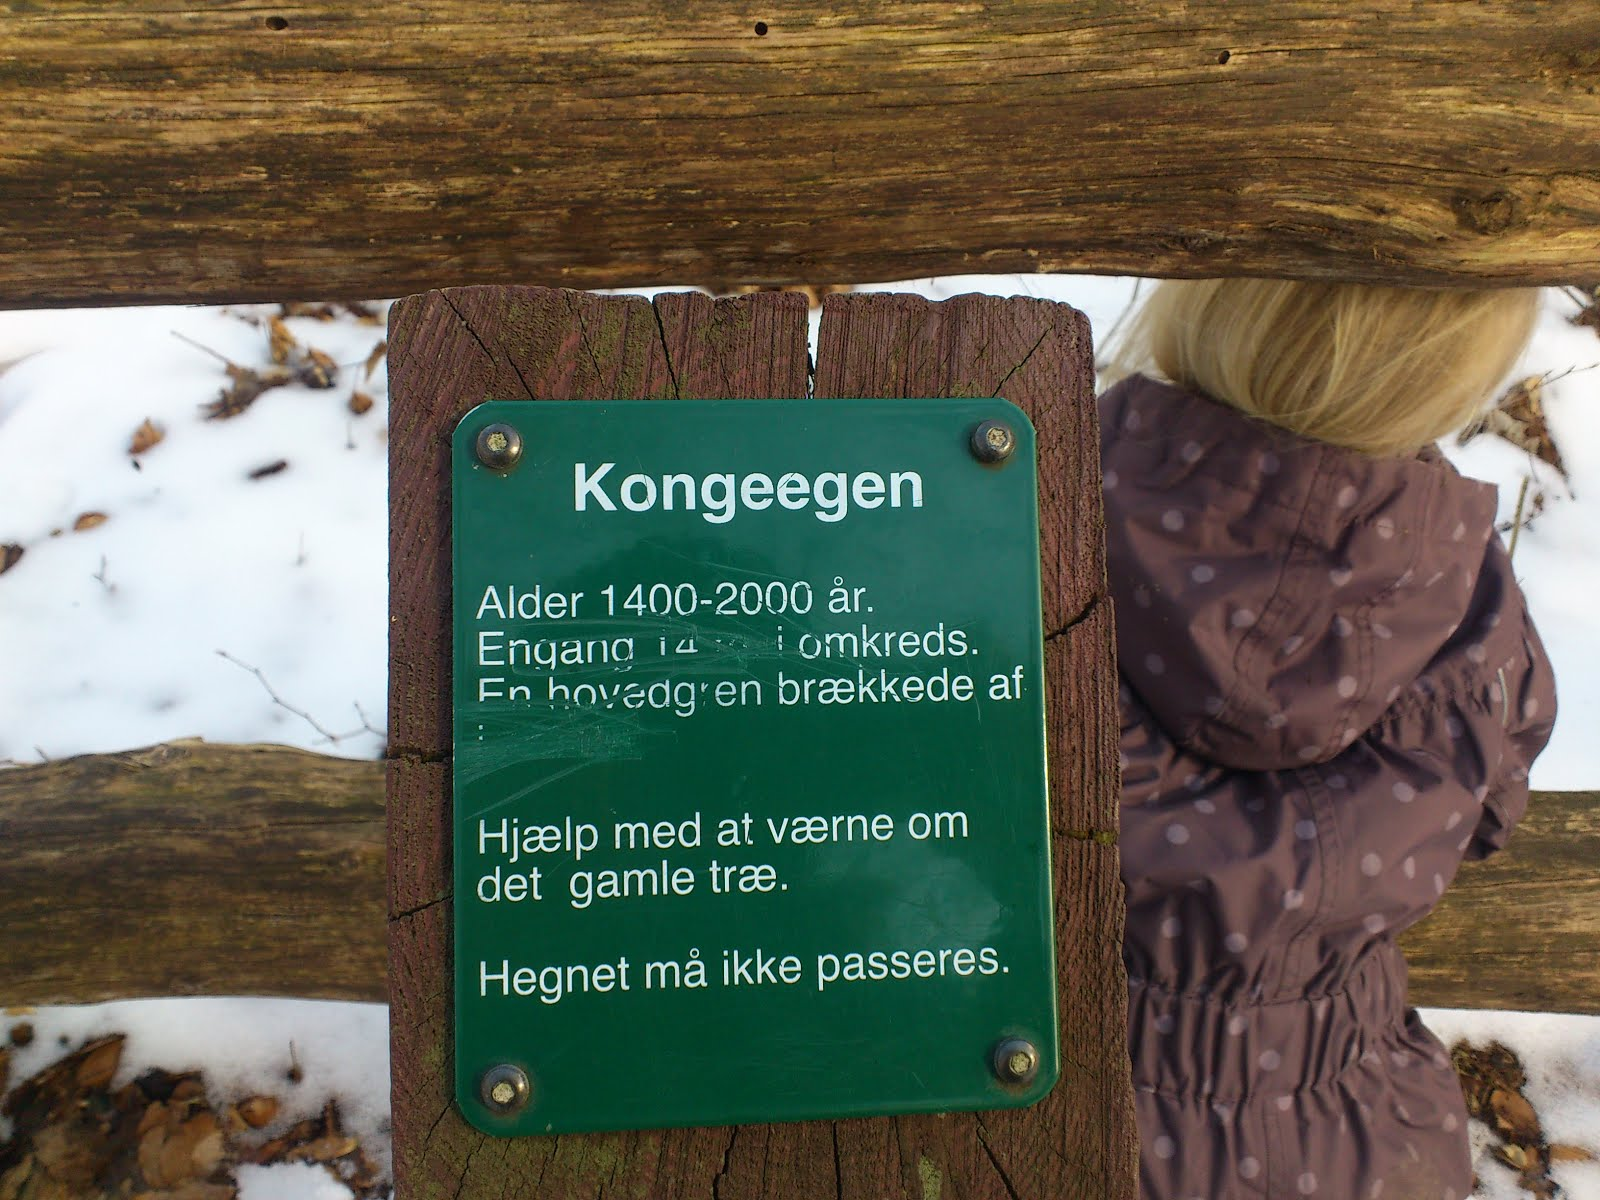 kongeegen kort Johansens Journaler: Kongeegen